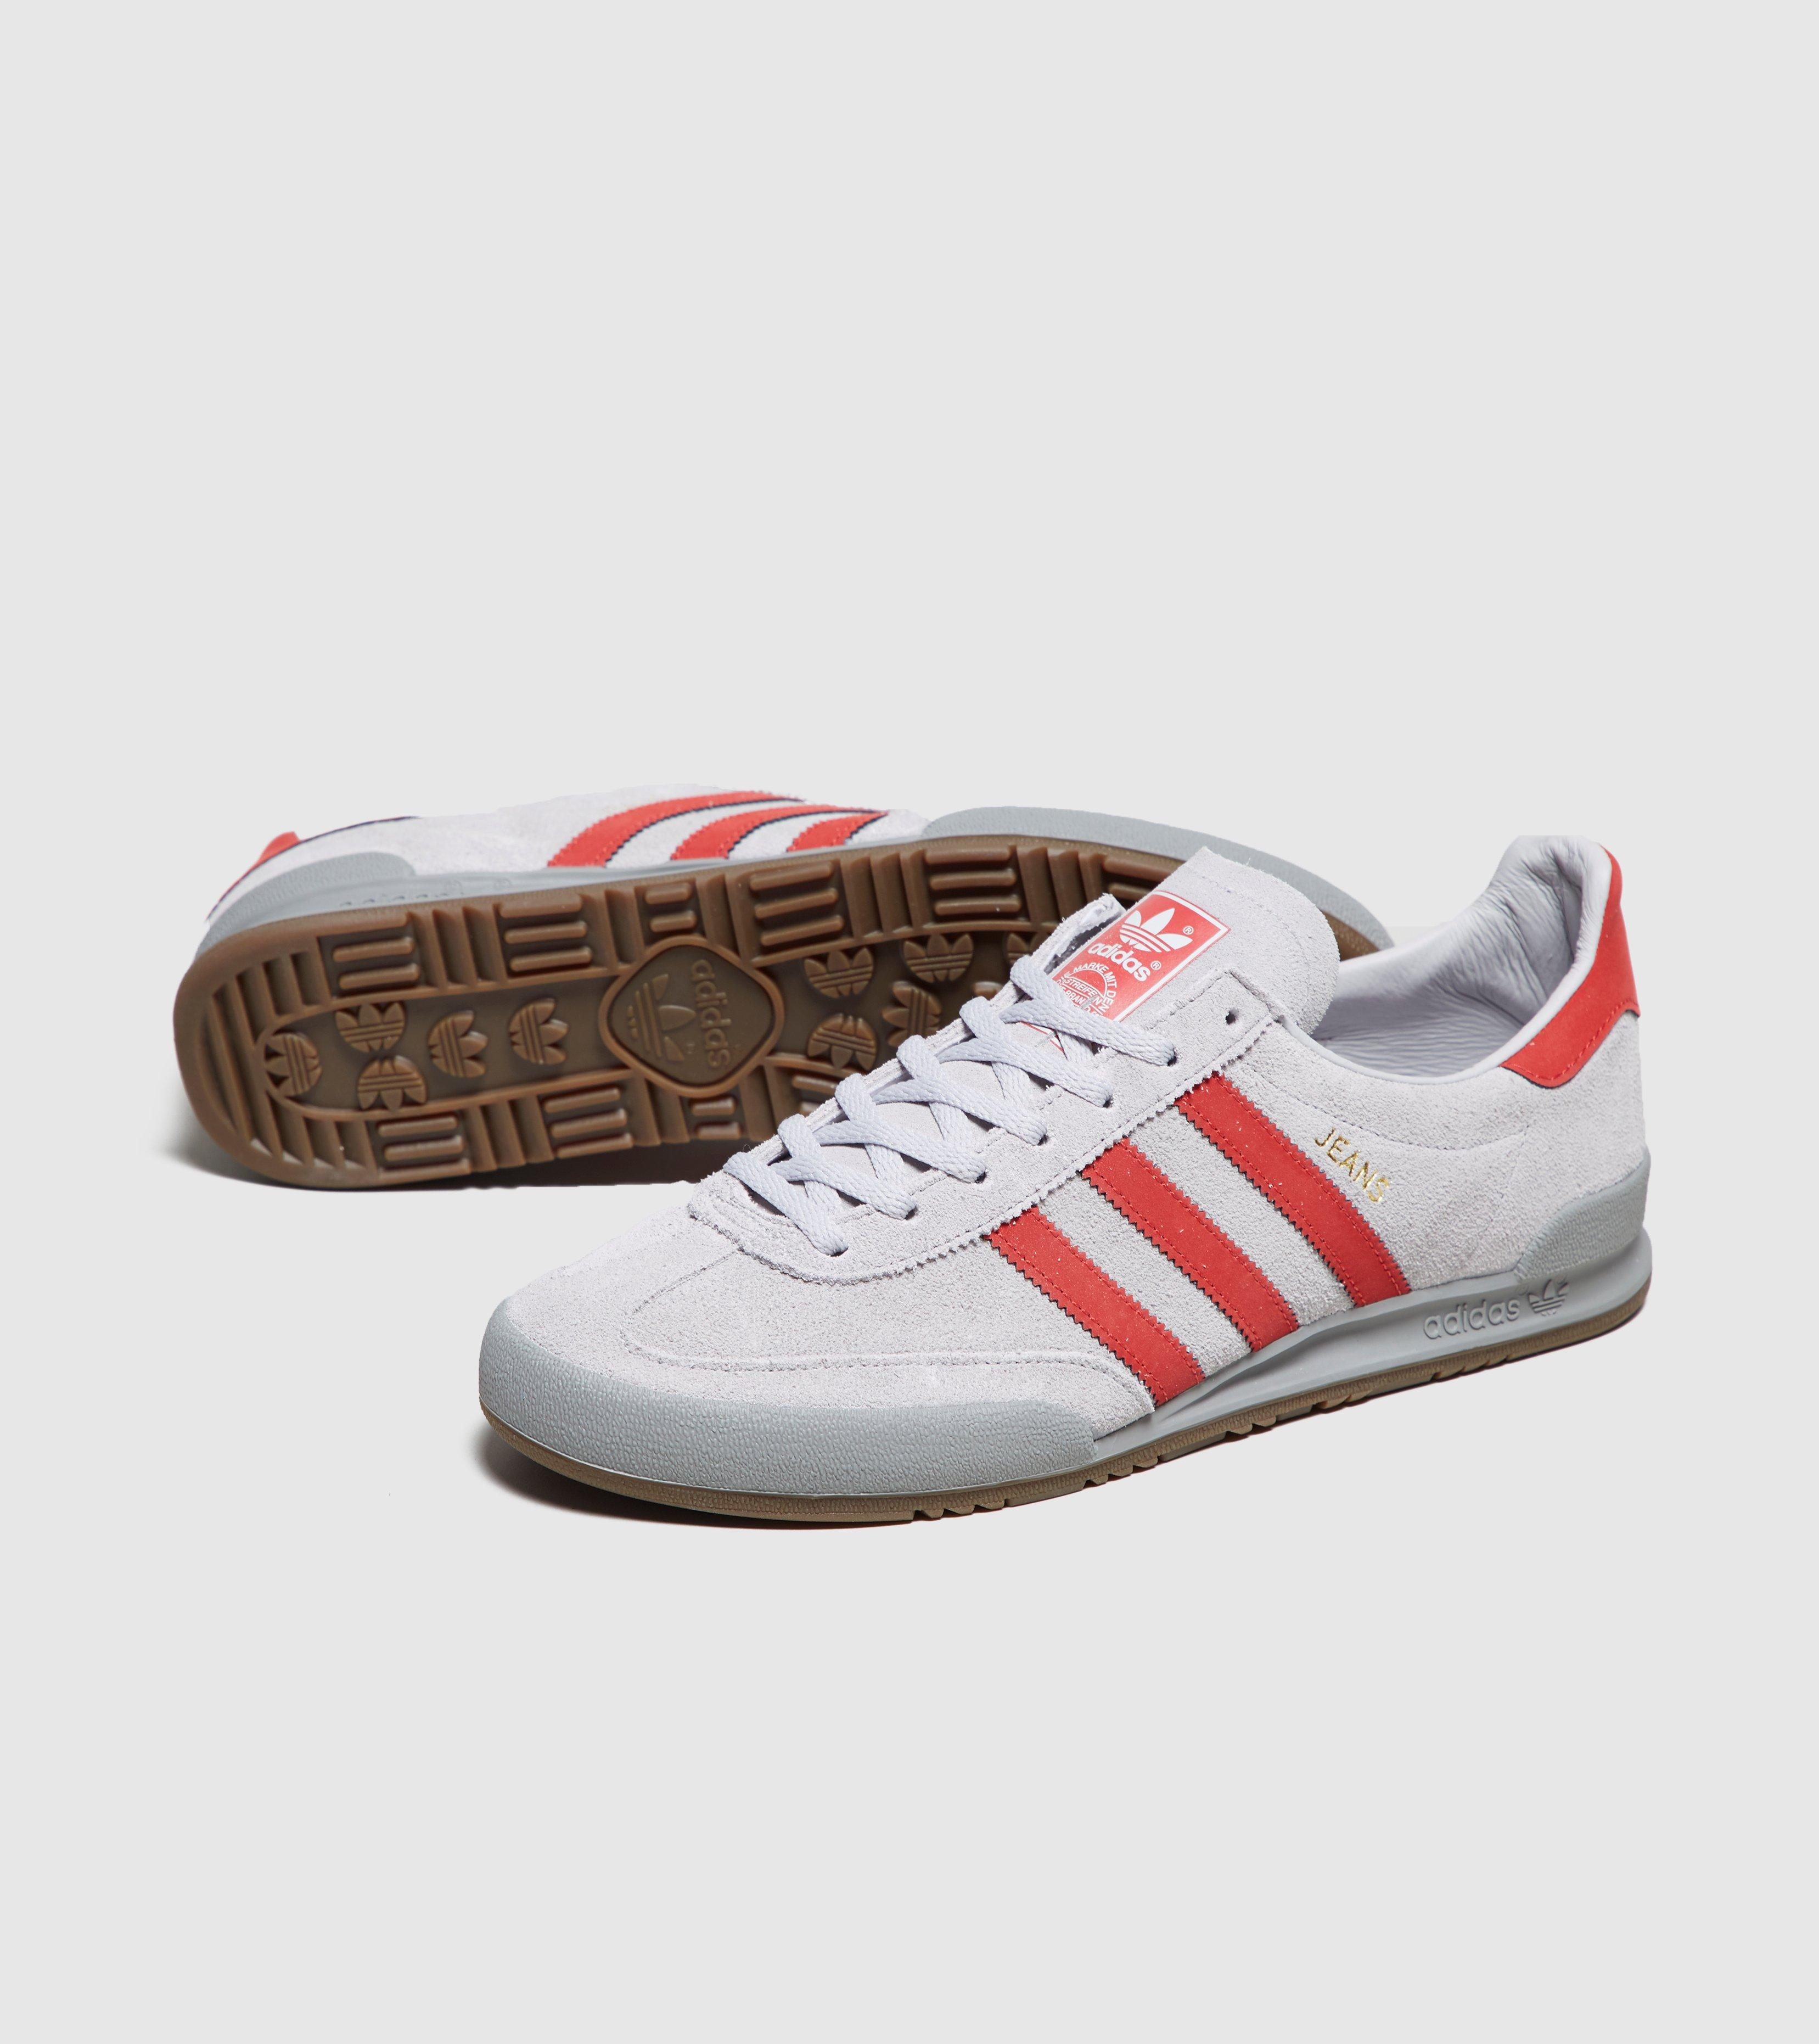 promo code 73f78 6466e ... hot sale Lyst - Adidas Originals Jeans og Pack in Gray for Men e05e3  0d1d8 elegant shoes ...